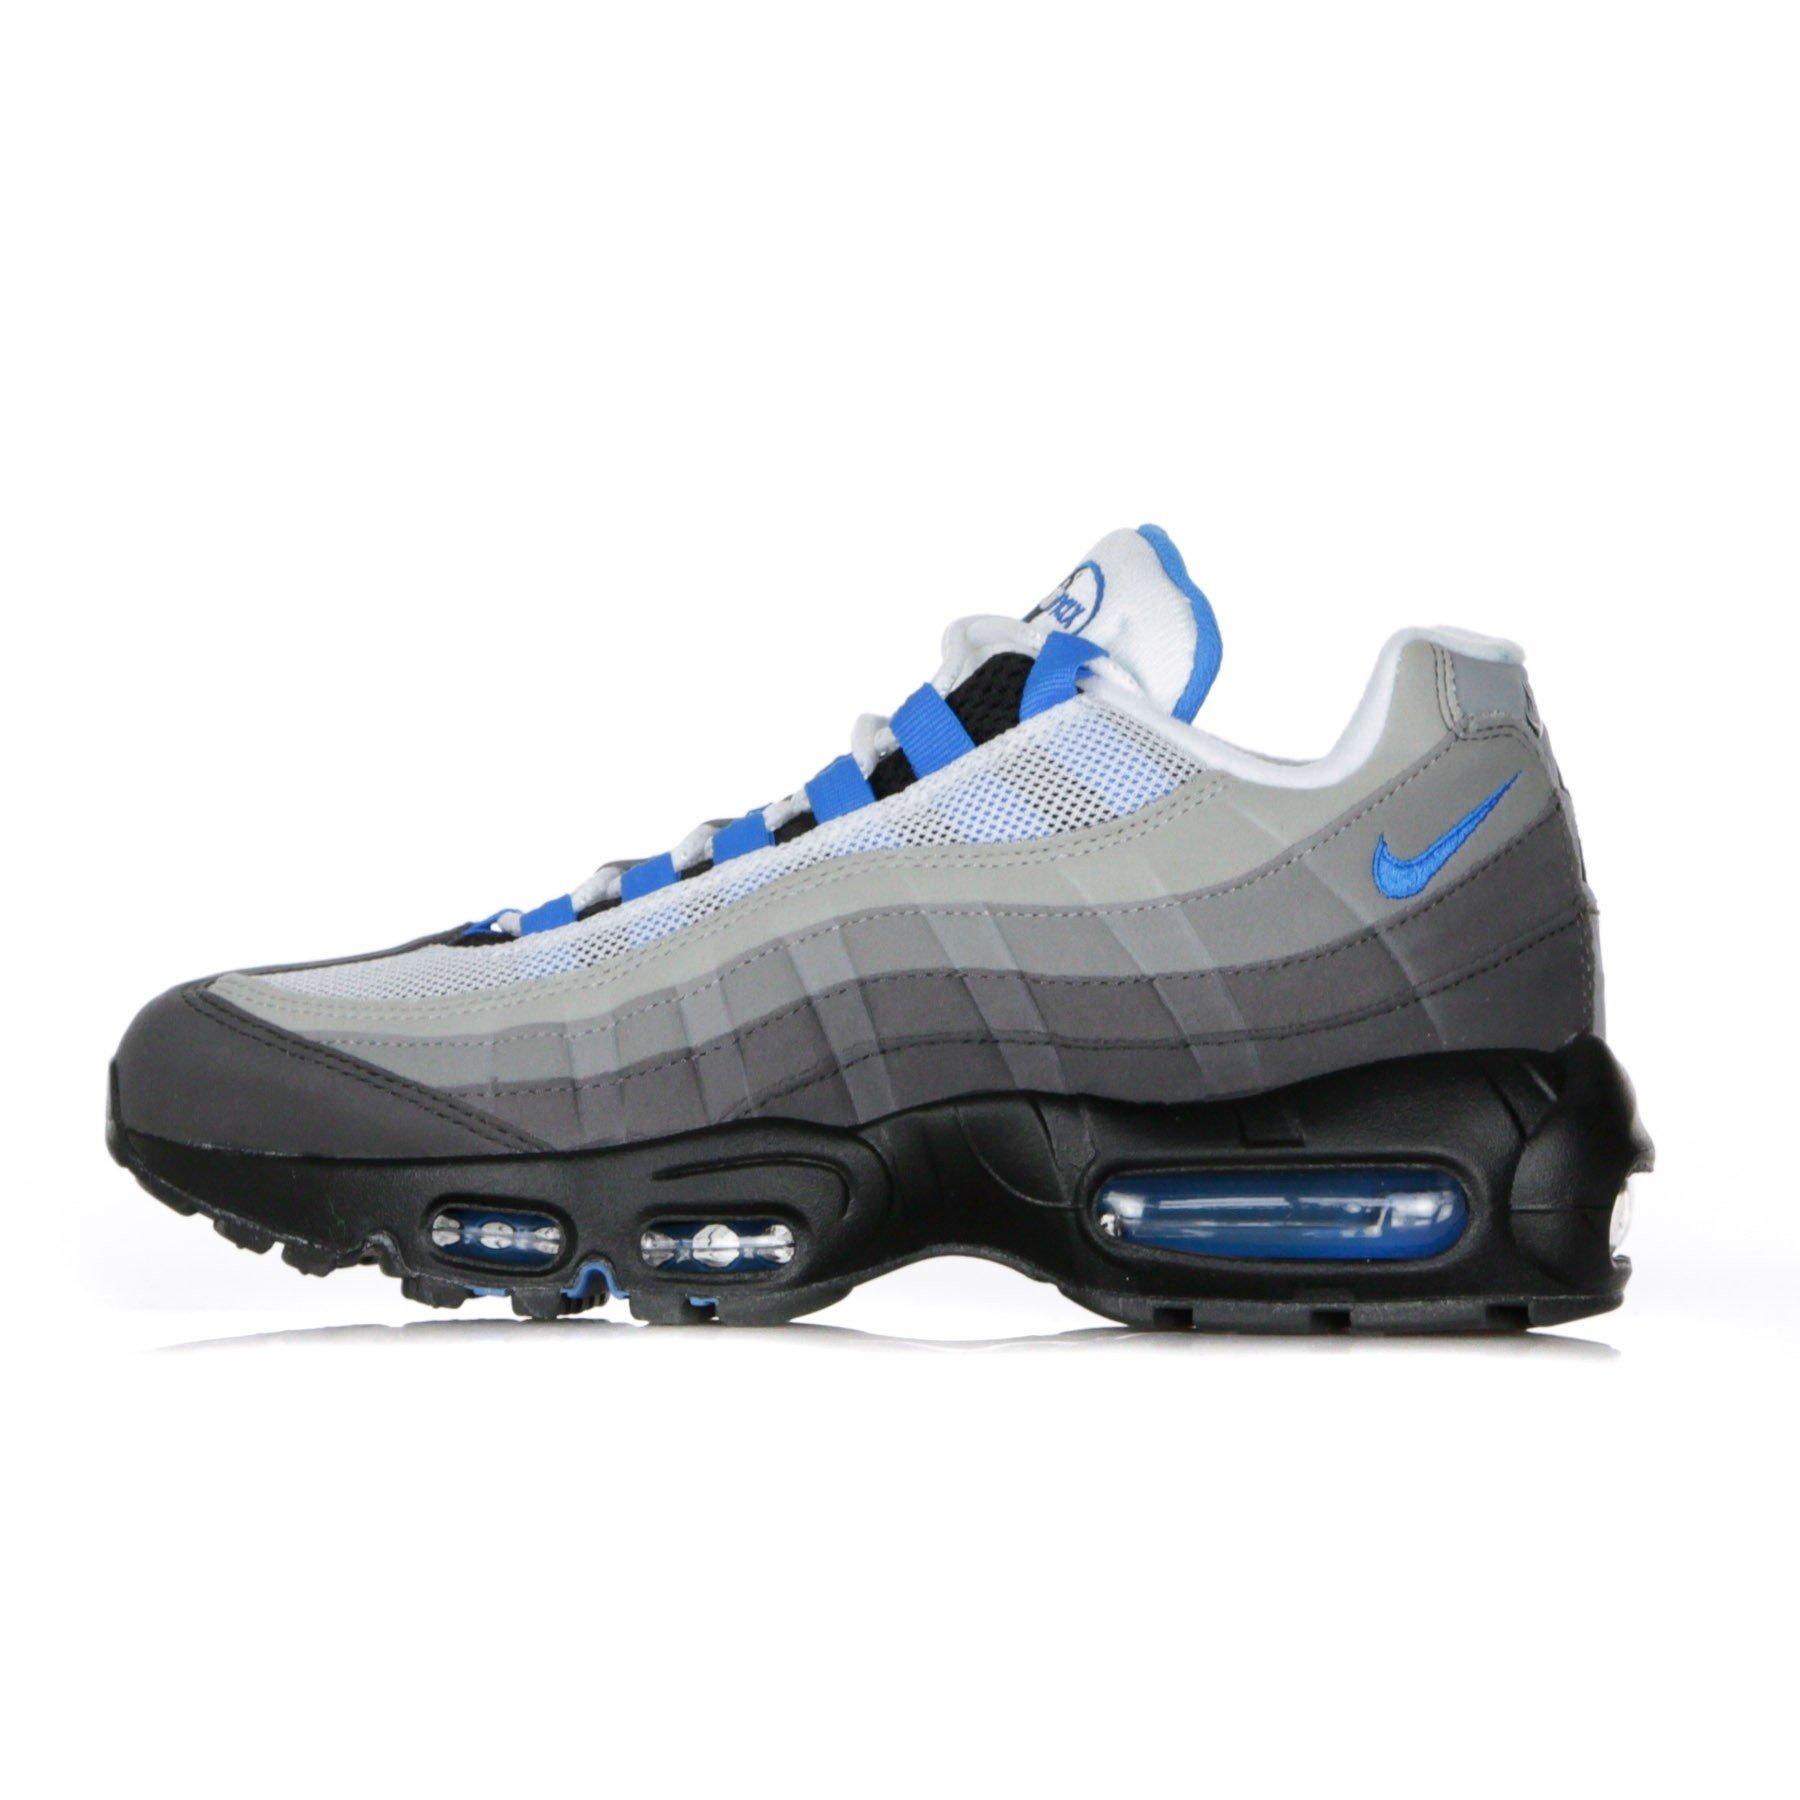 Nike uomo air max 95 AT8696-100 | Atipicishop.com